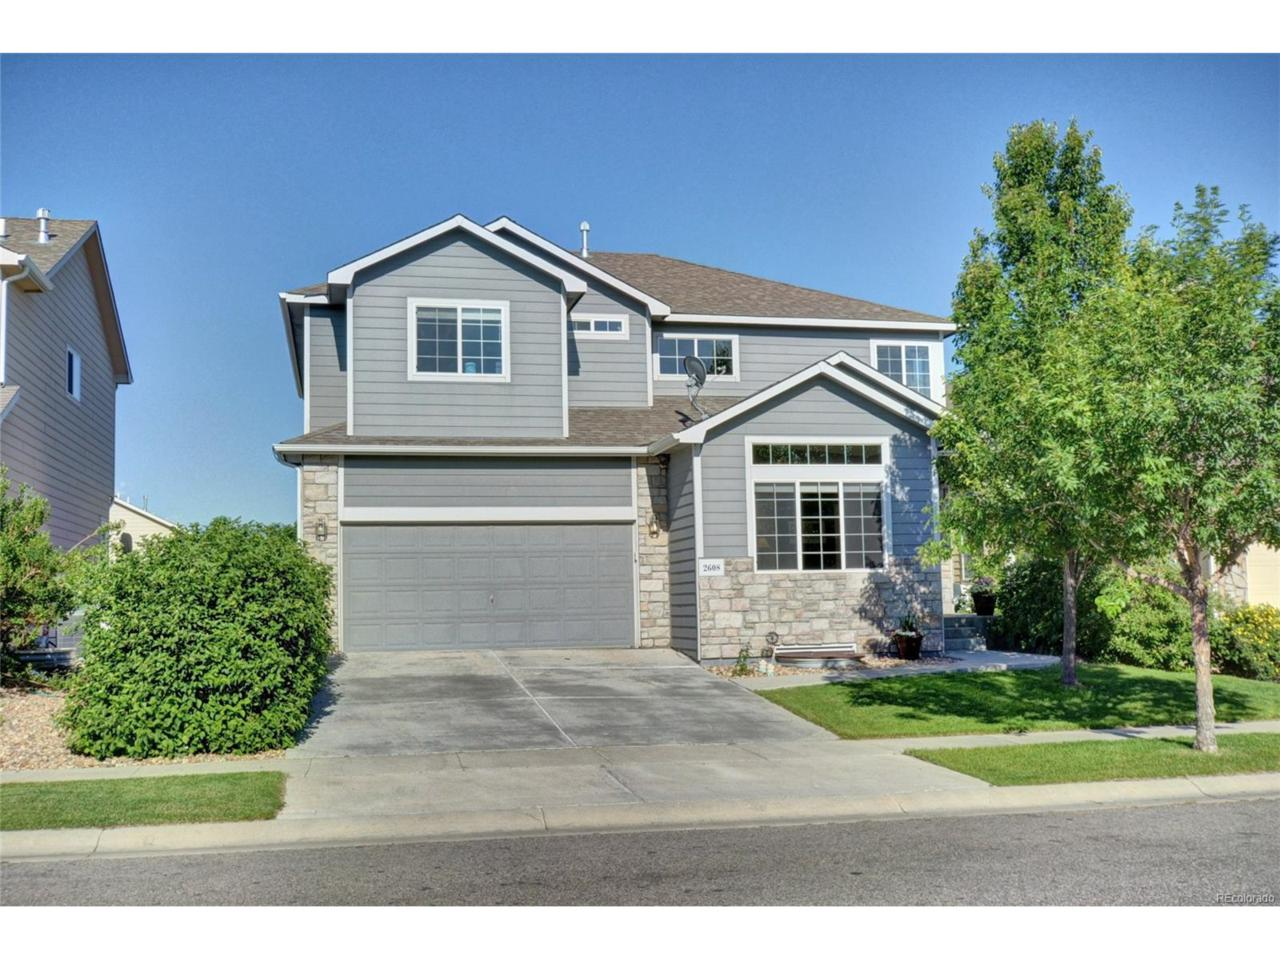 2608 Clarion Lane, Fort Collins, CO 80524 (MLS #3320325) :: 8z Real Estate